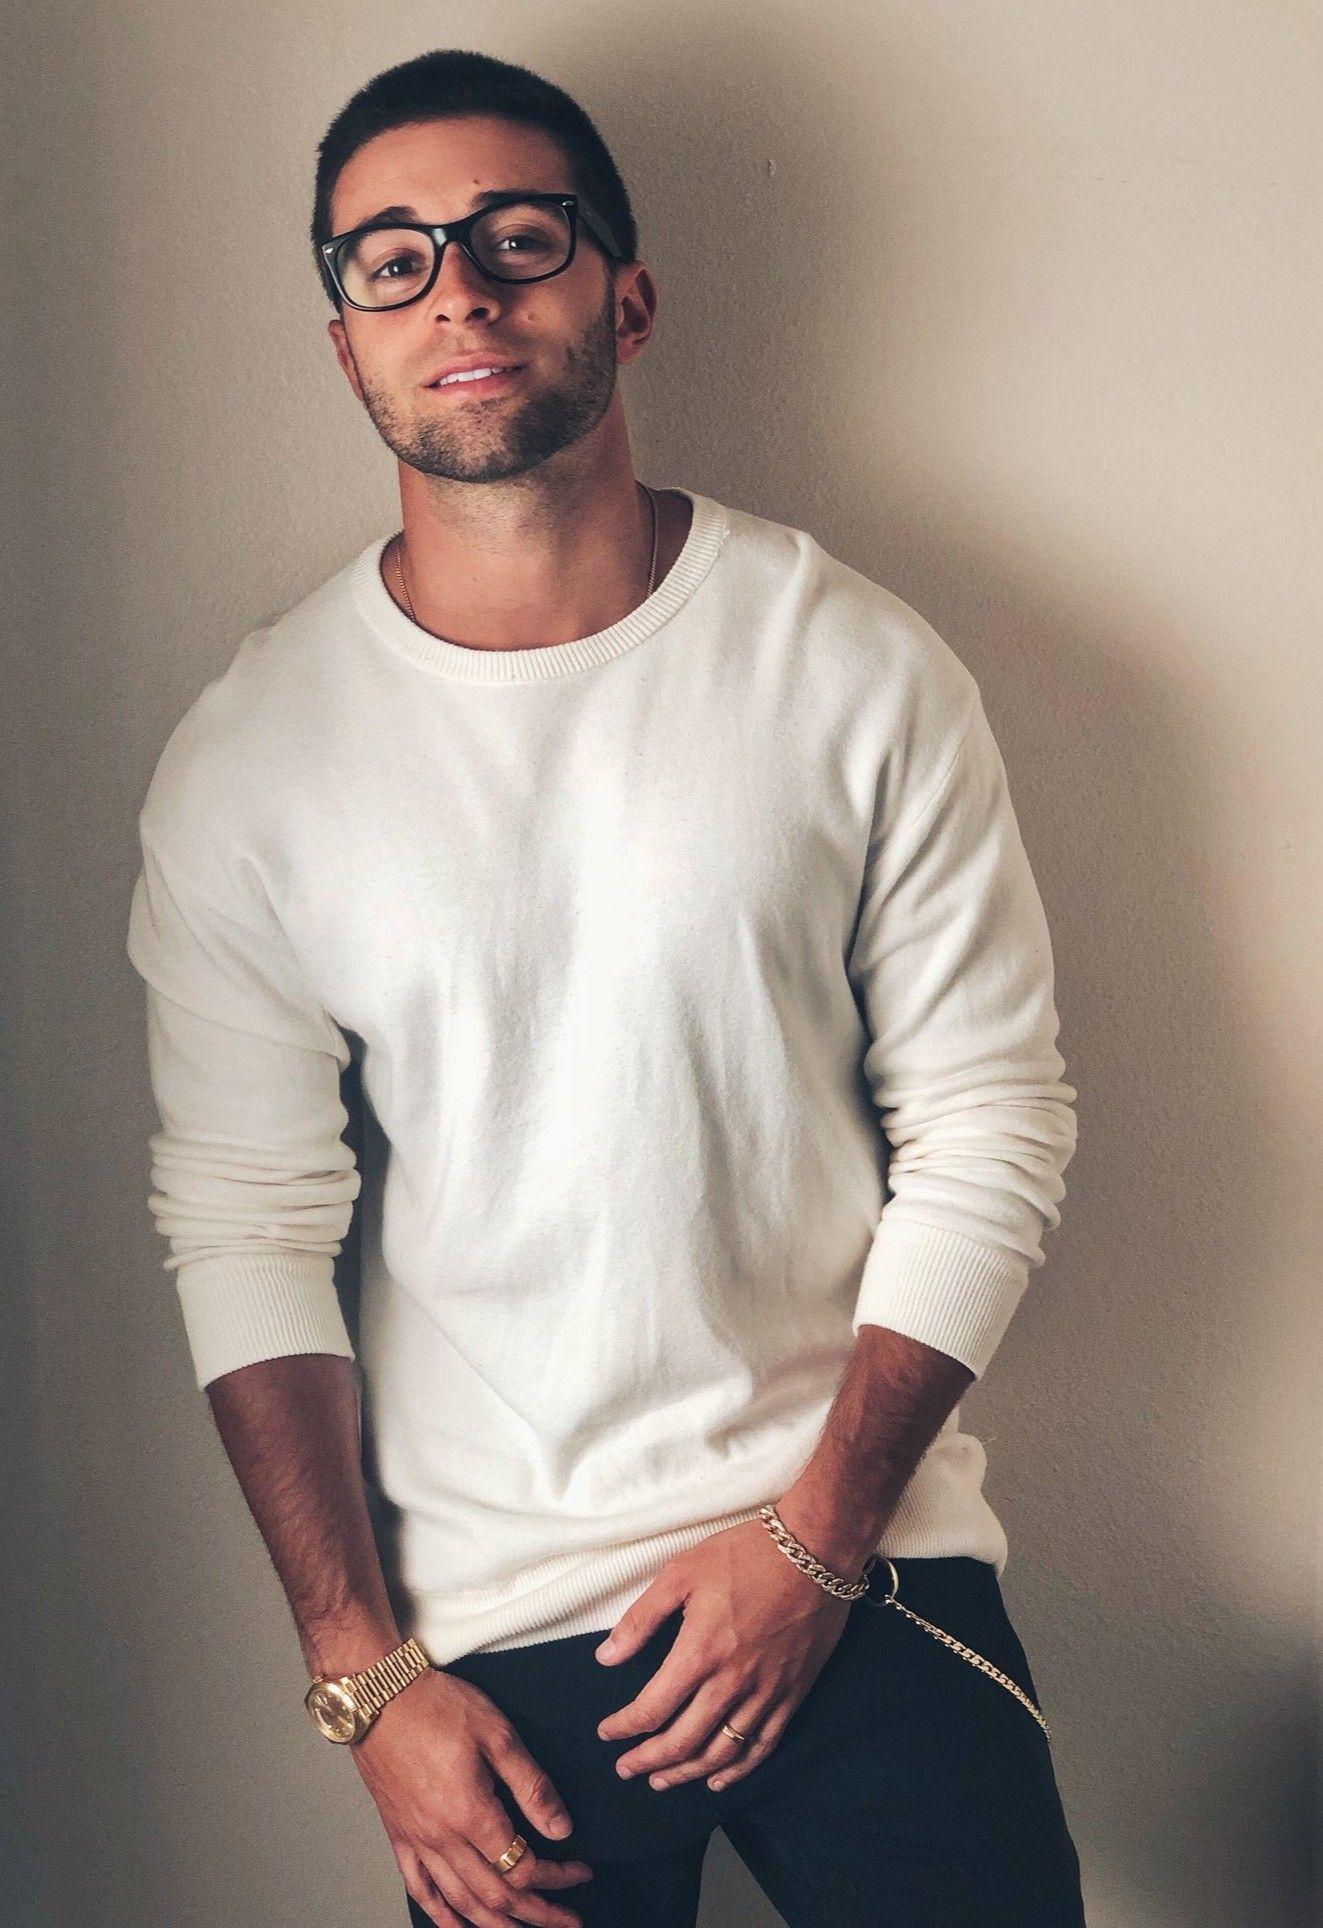 Alexis_Superfans Shirtless Male Celebs: Jake Miller